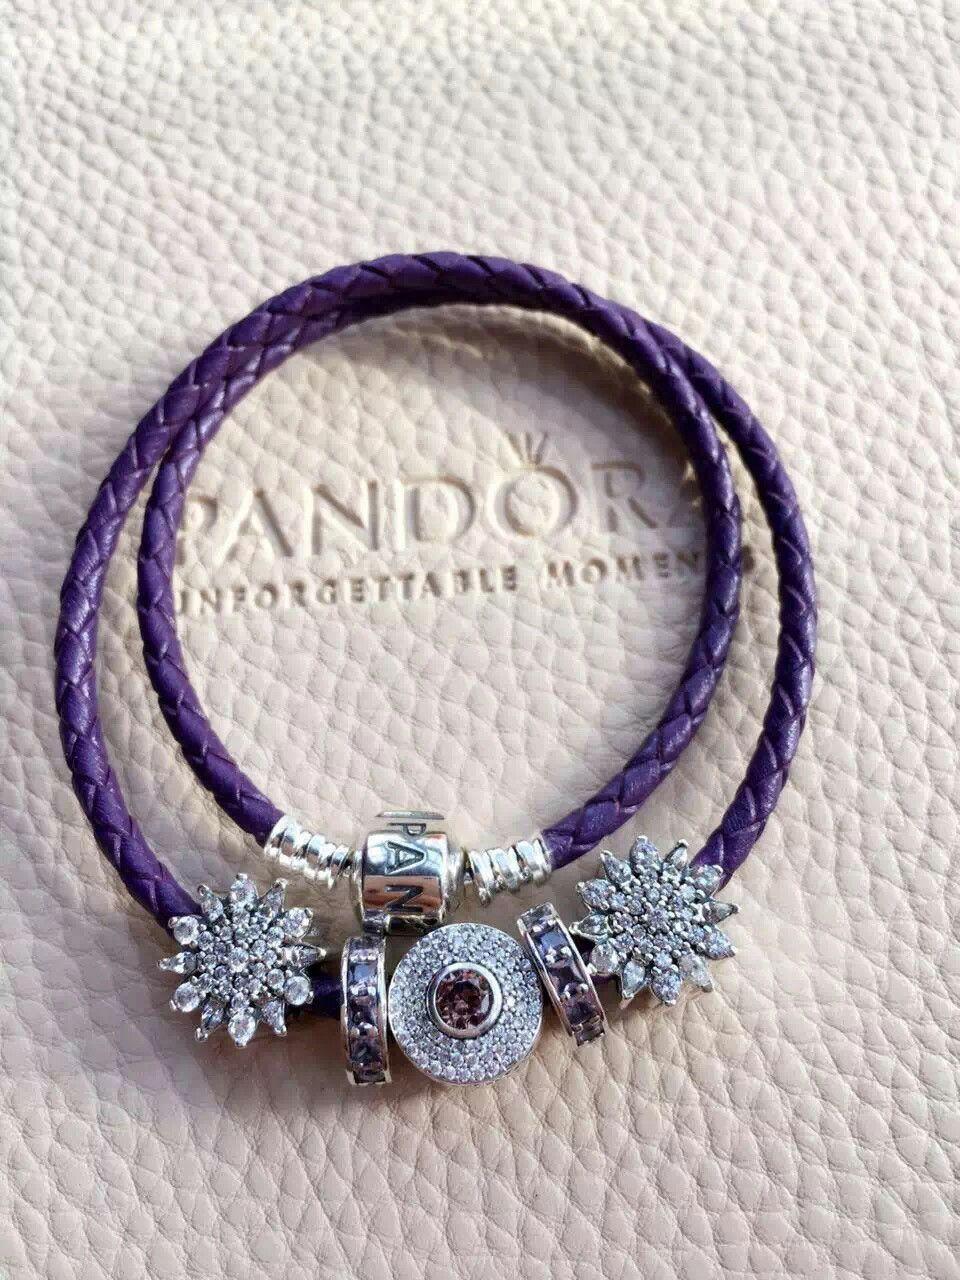 $179 Pandora Leather Charm Bracelet Purple. Hot Sale!